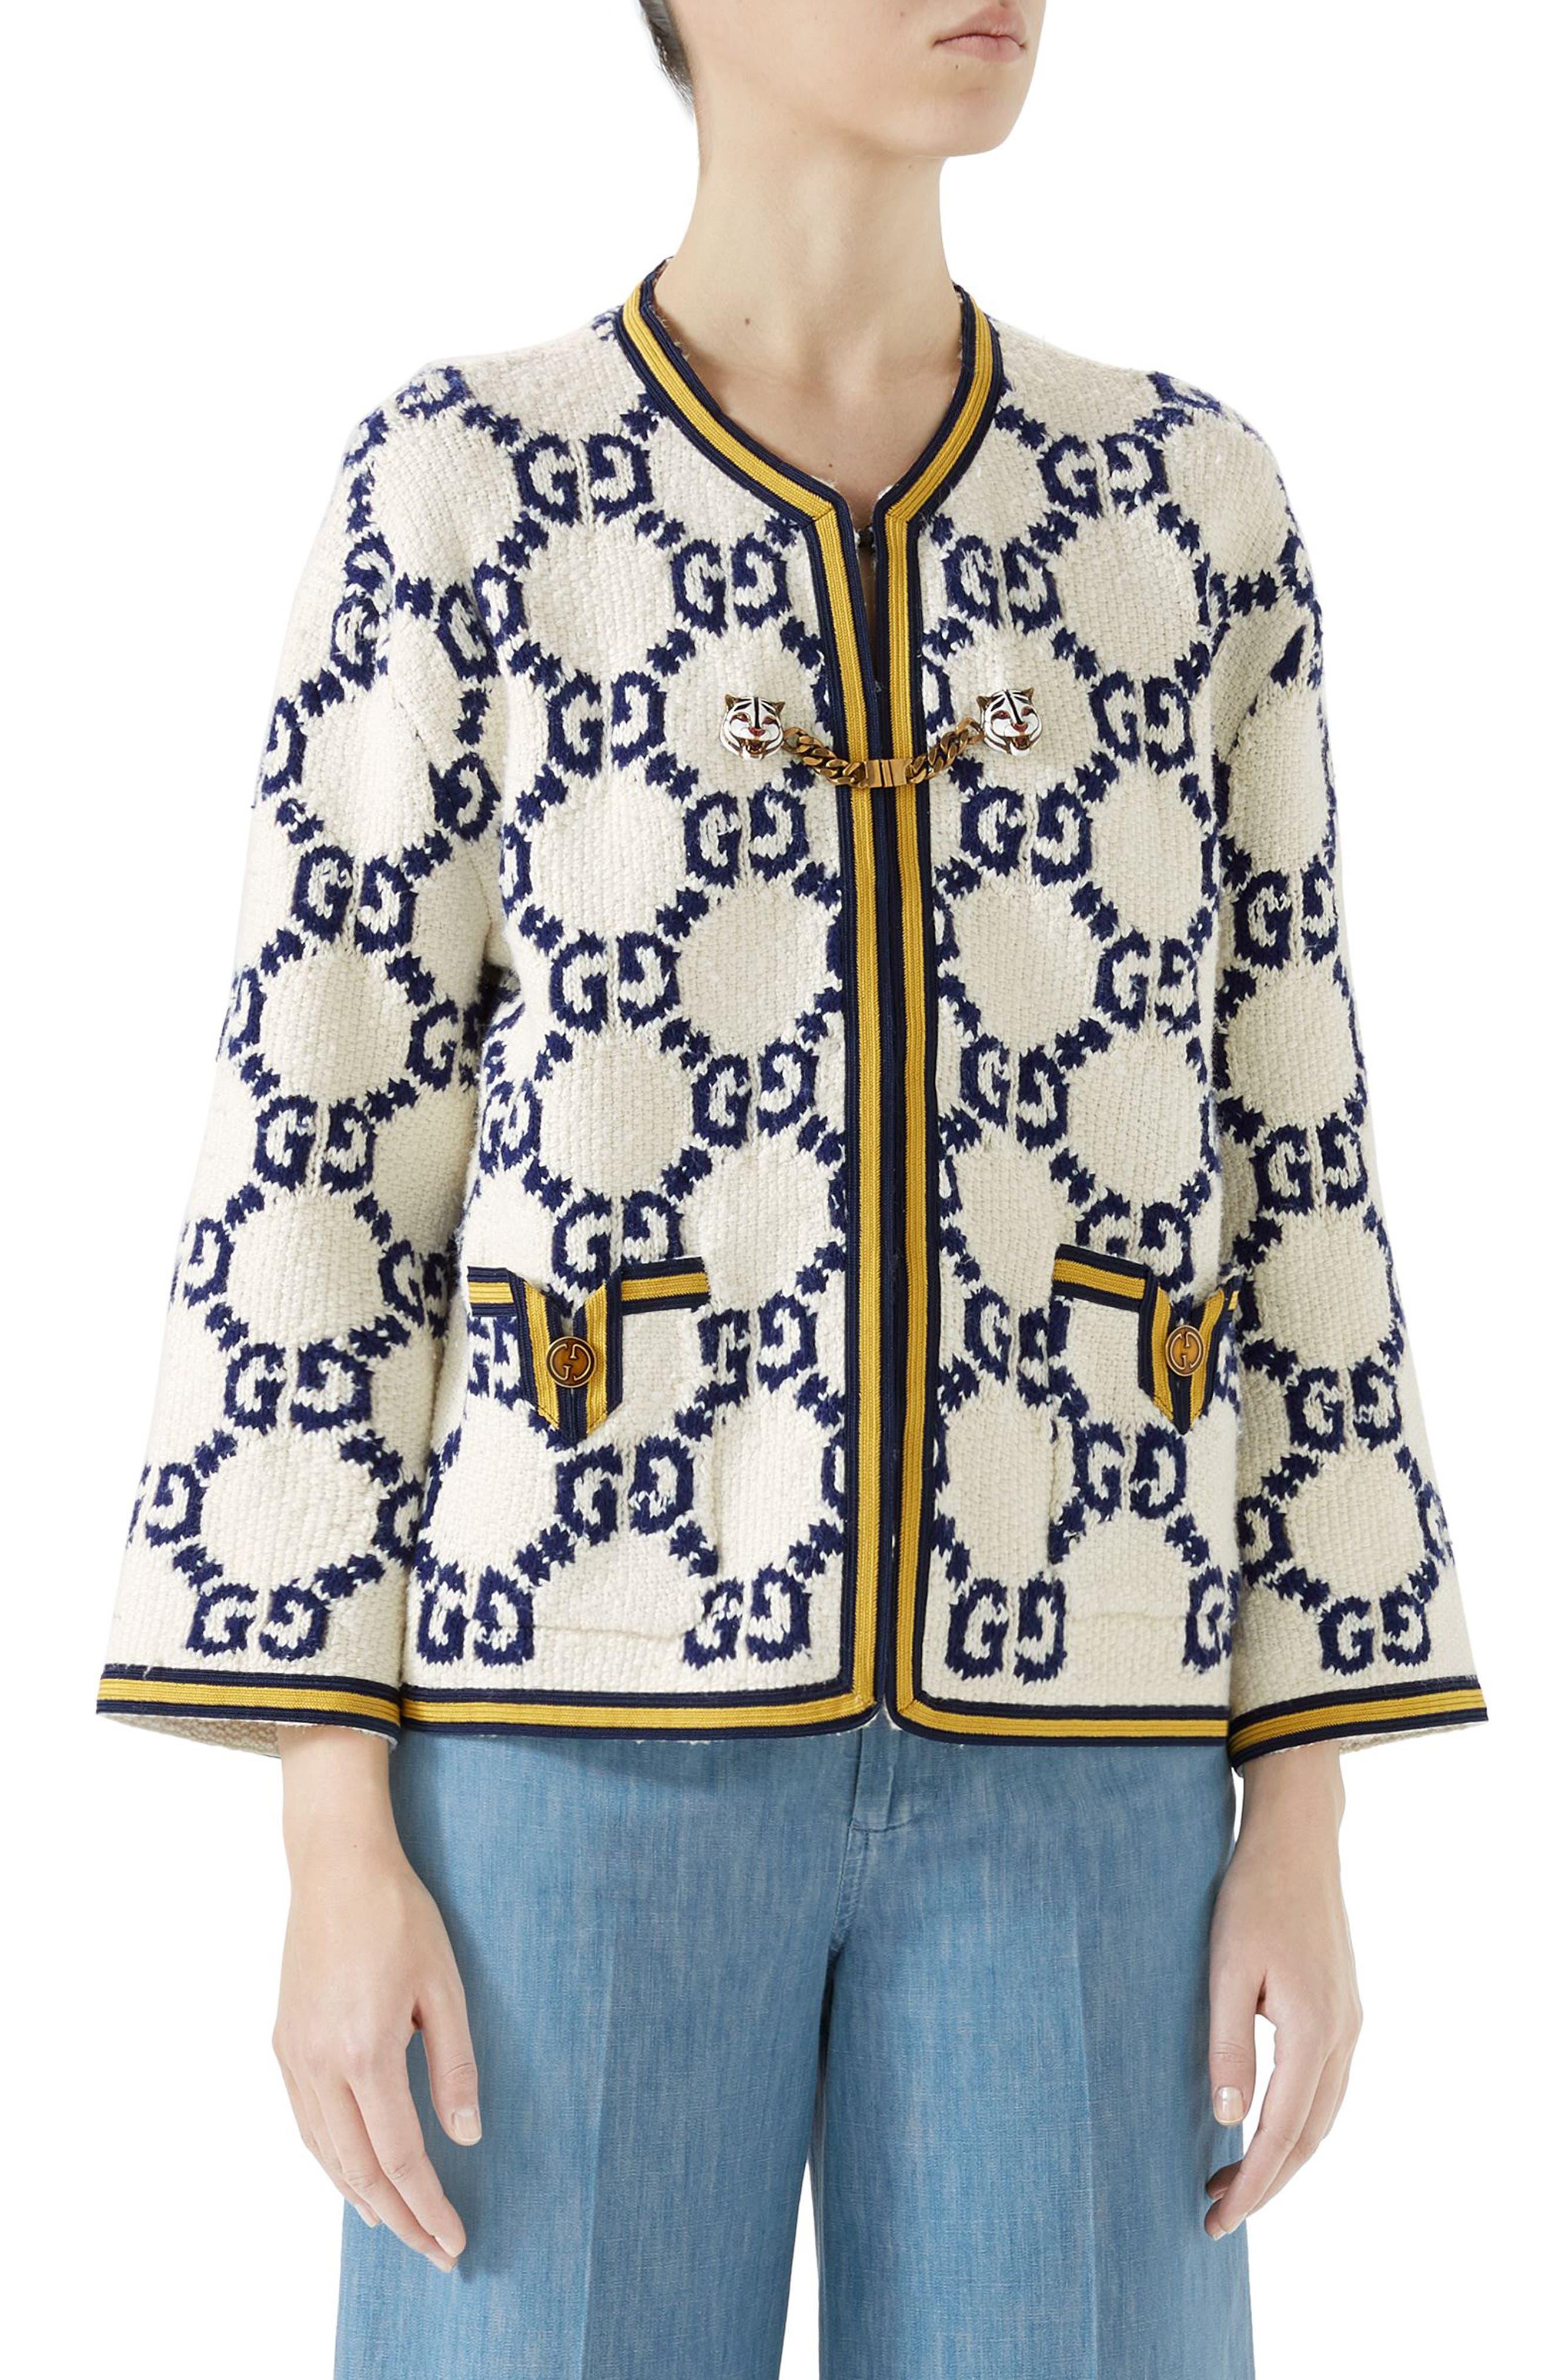 GG Textured Silk, Wool & Linen Tweed Jacket,                             Main thumbnail 1, color,                             Multi